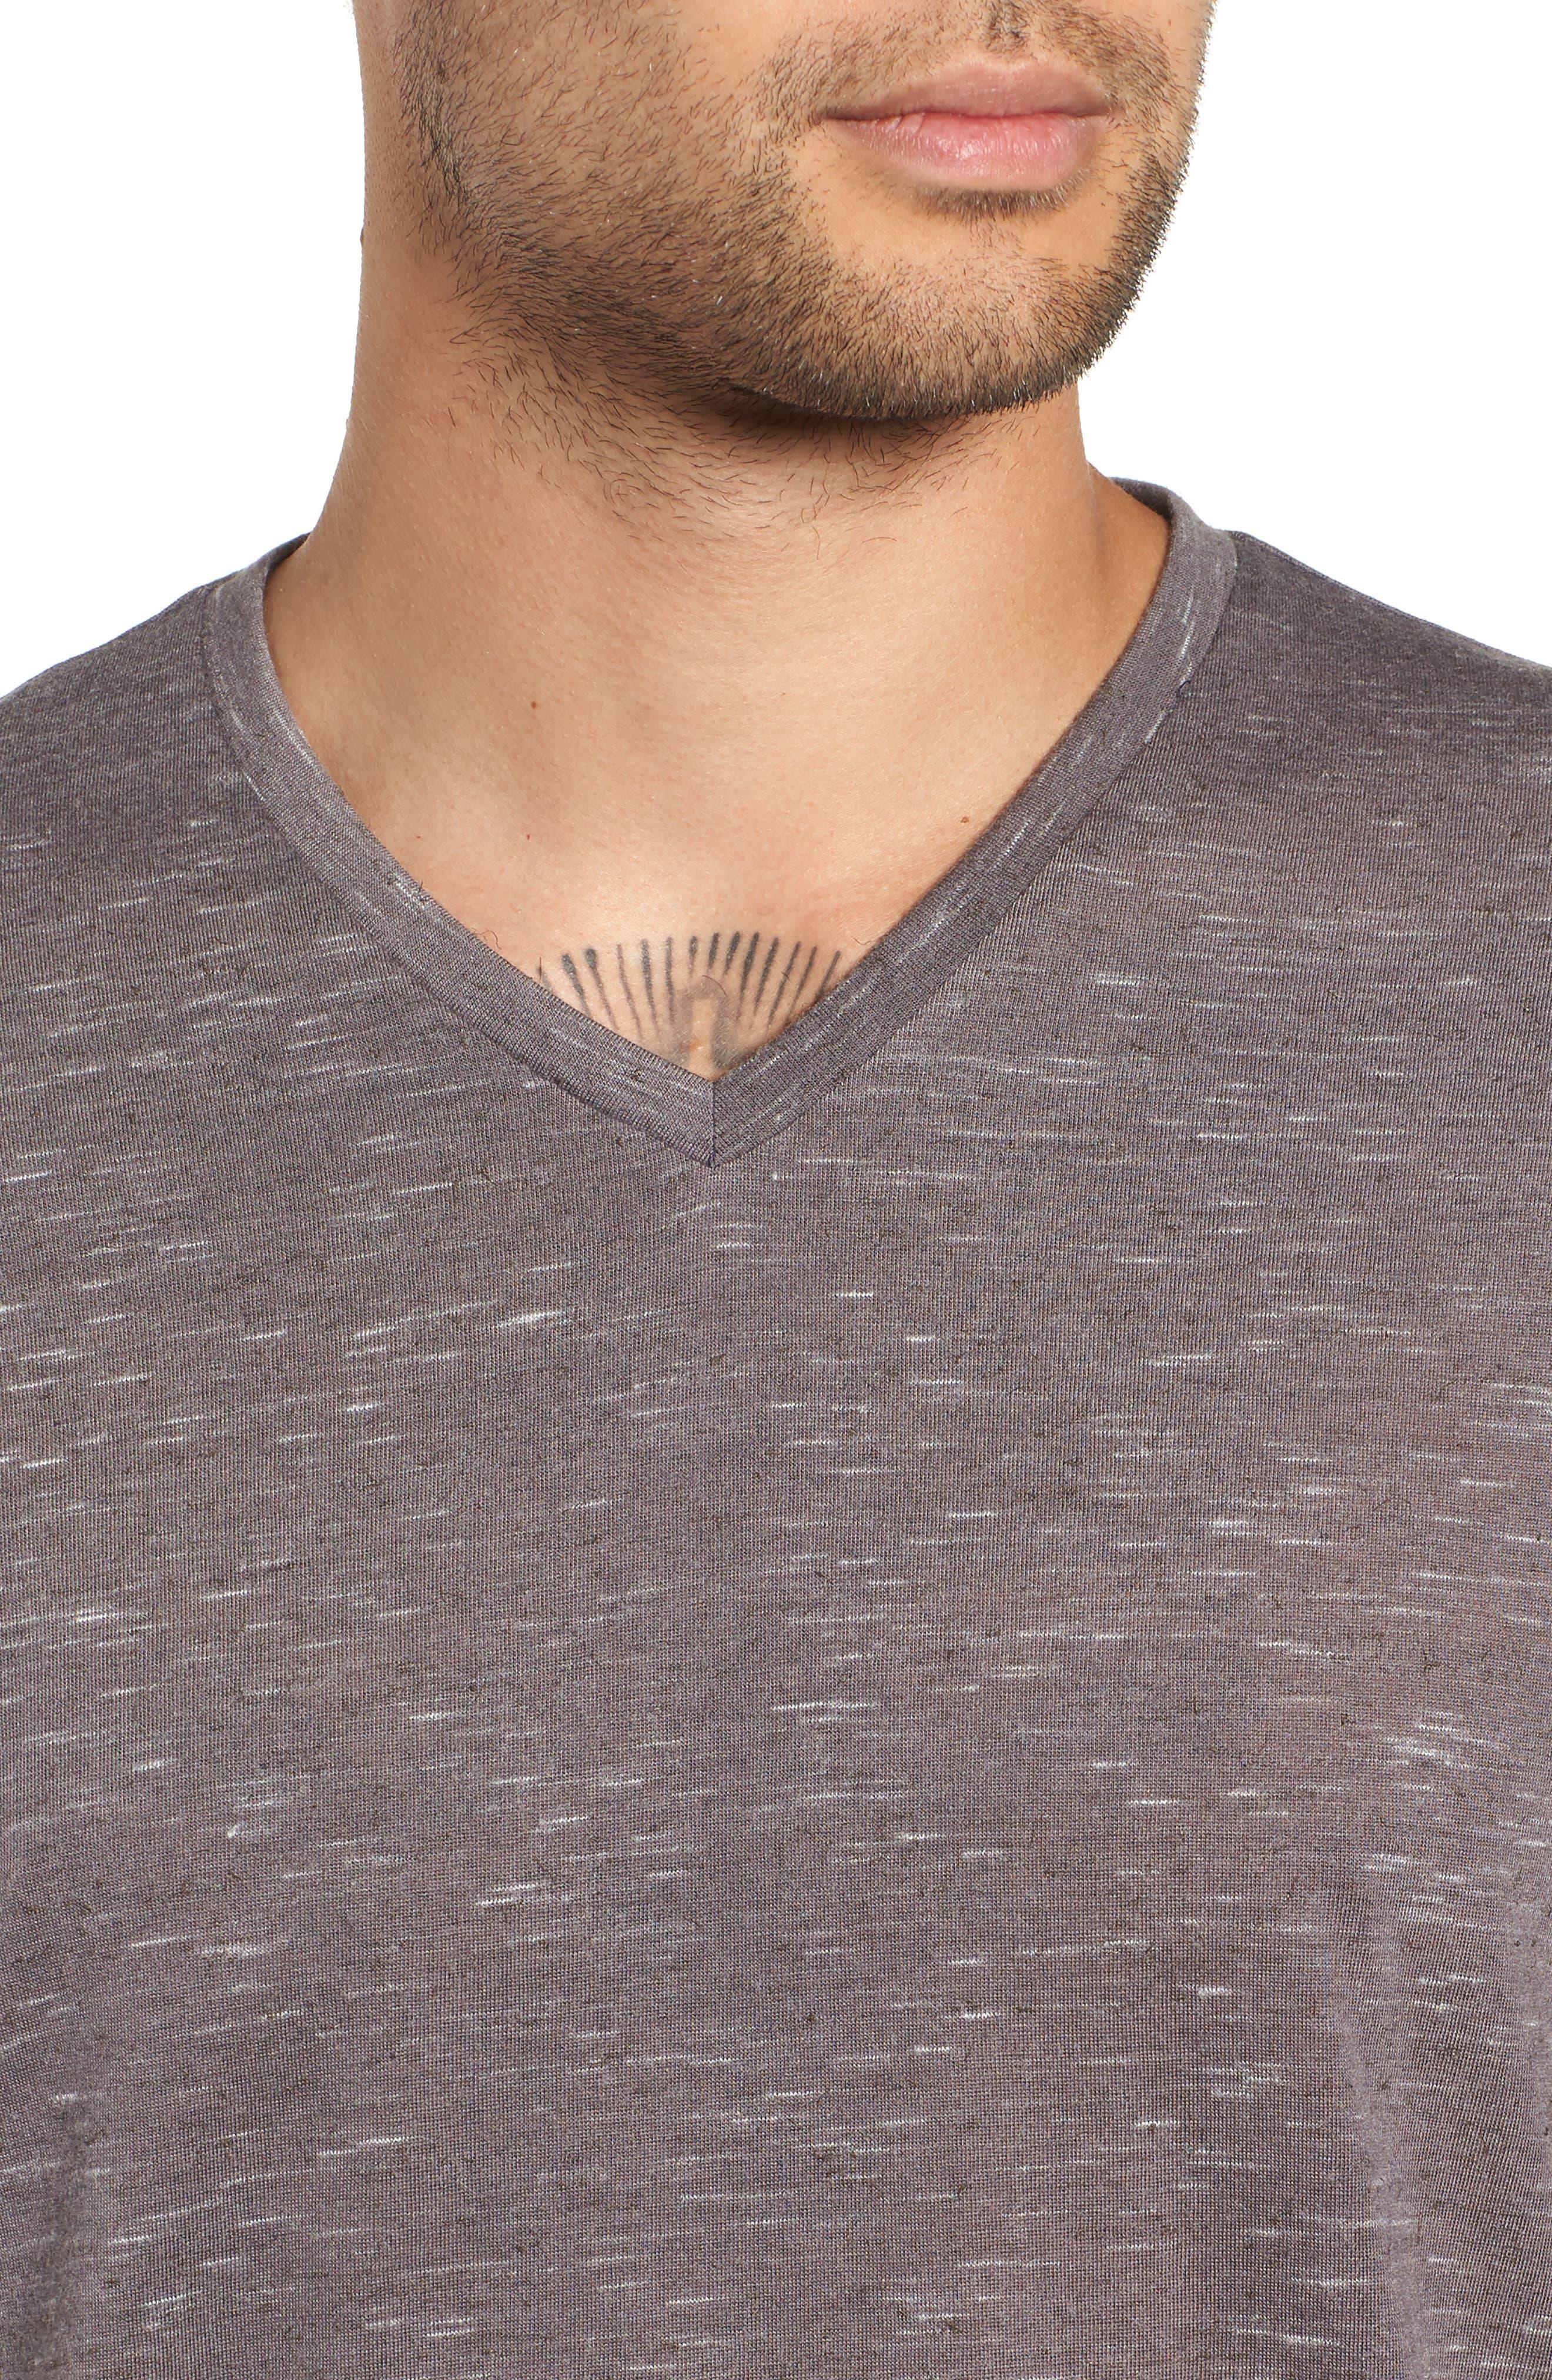 THE RAIL, Streaky V-Neck T-Shirt, Alternate thumbnail 4, color, GREY TORNADO- WHITE